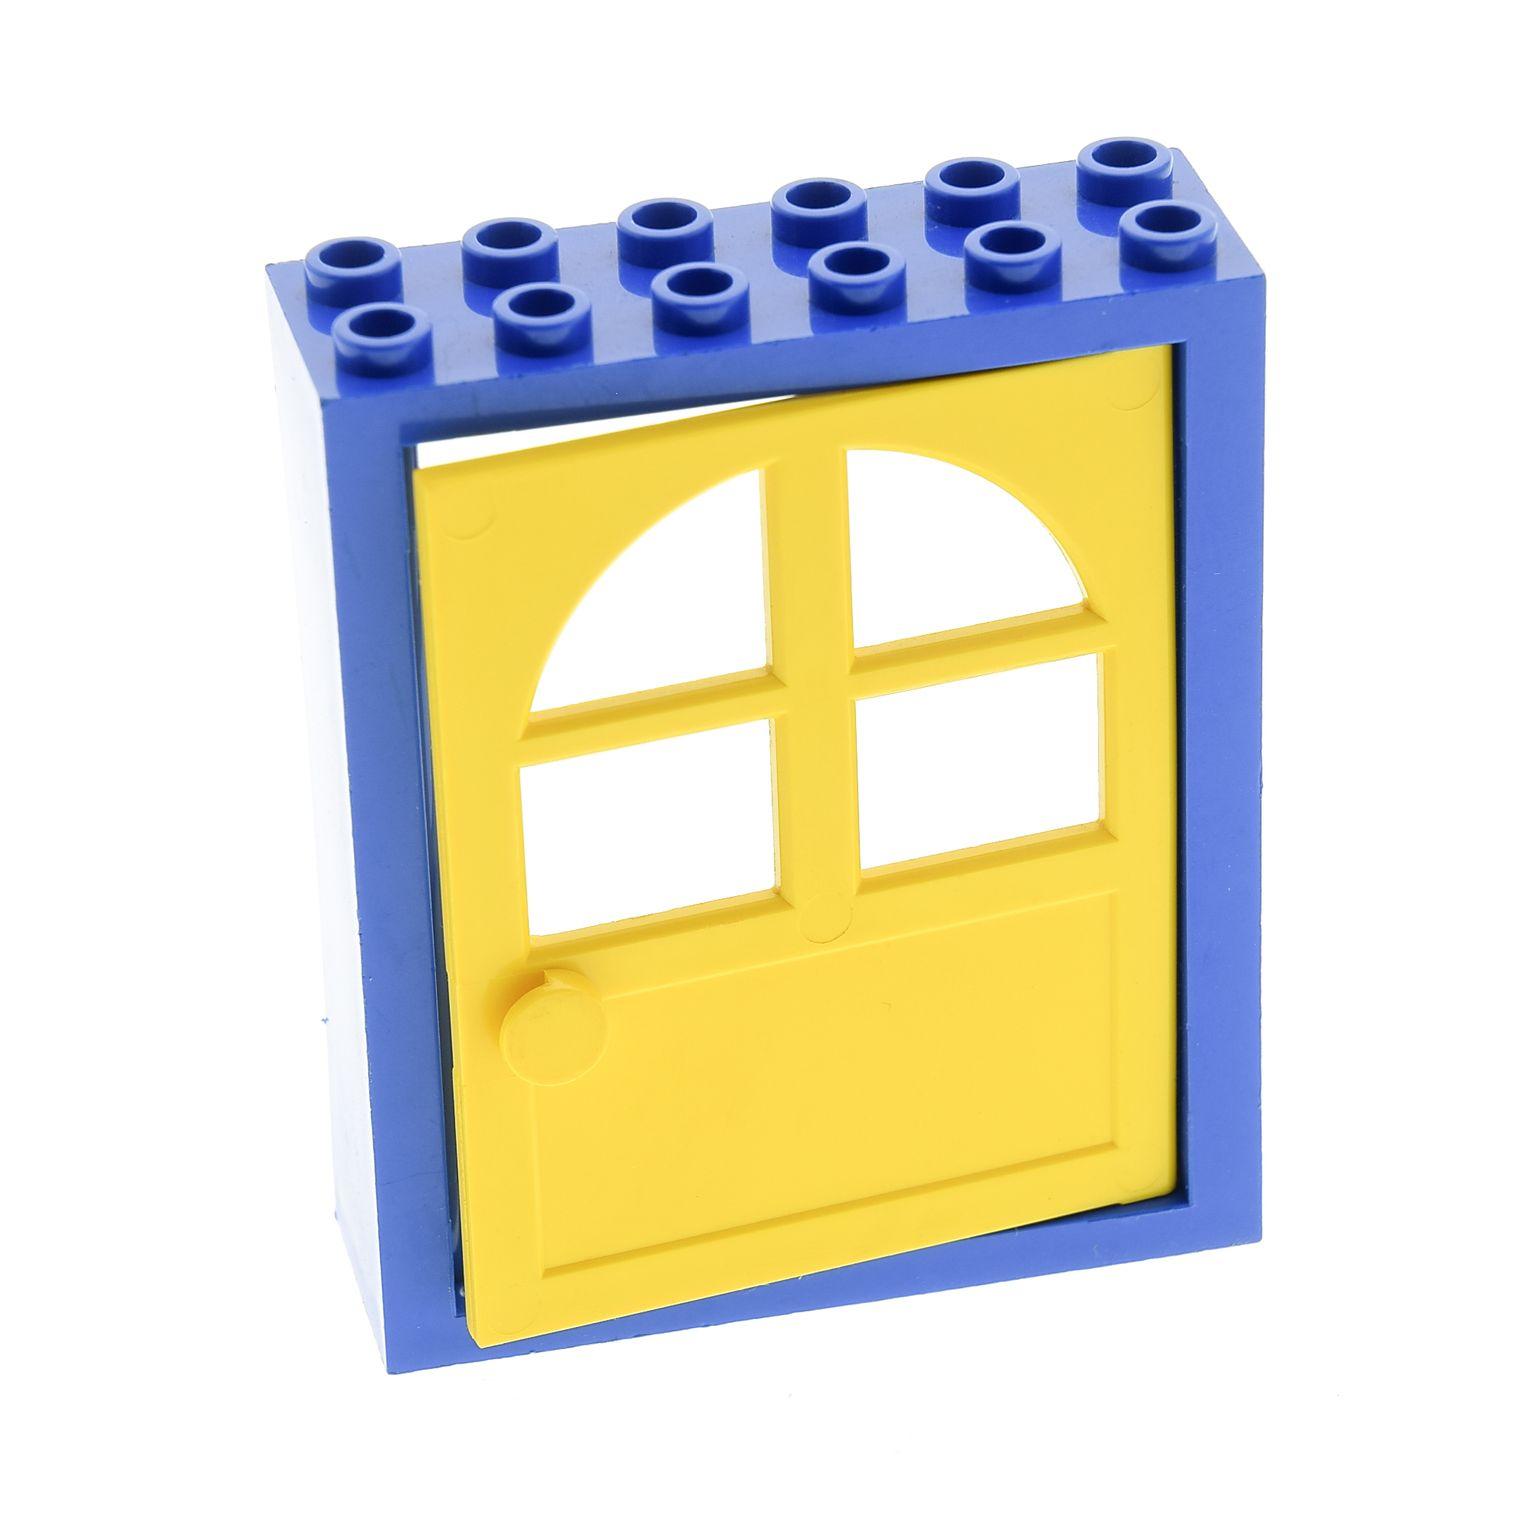 1 x Lego System Freestyle Haustür Rahmen blau 2x6x6 Tür Blatt gelb ...